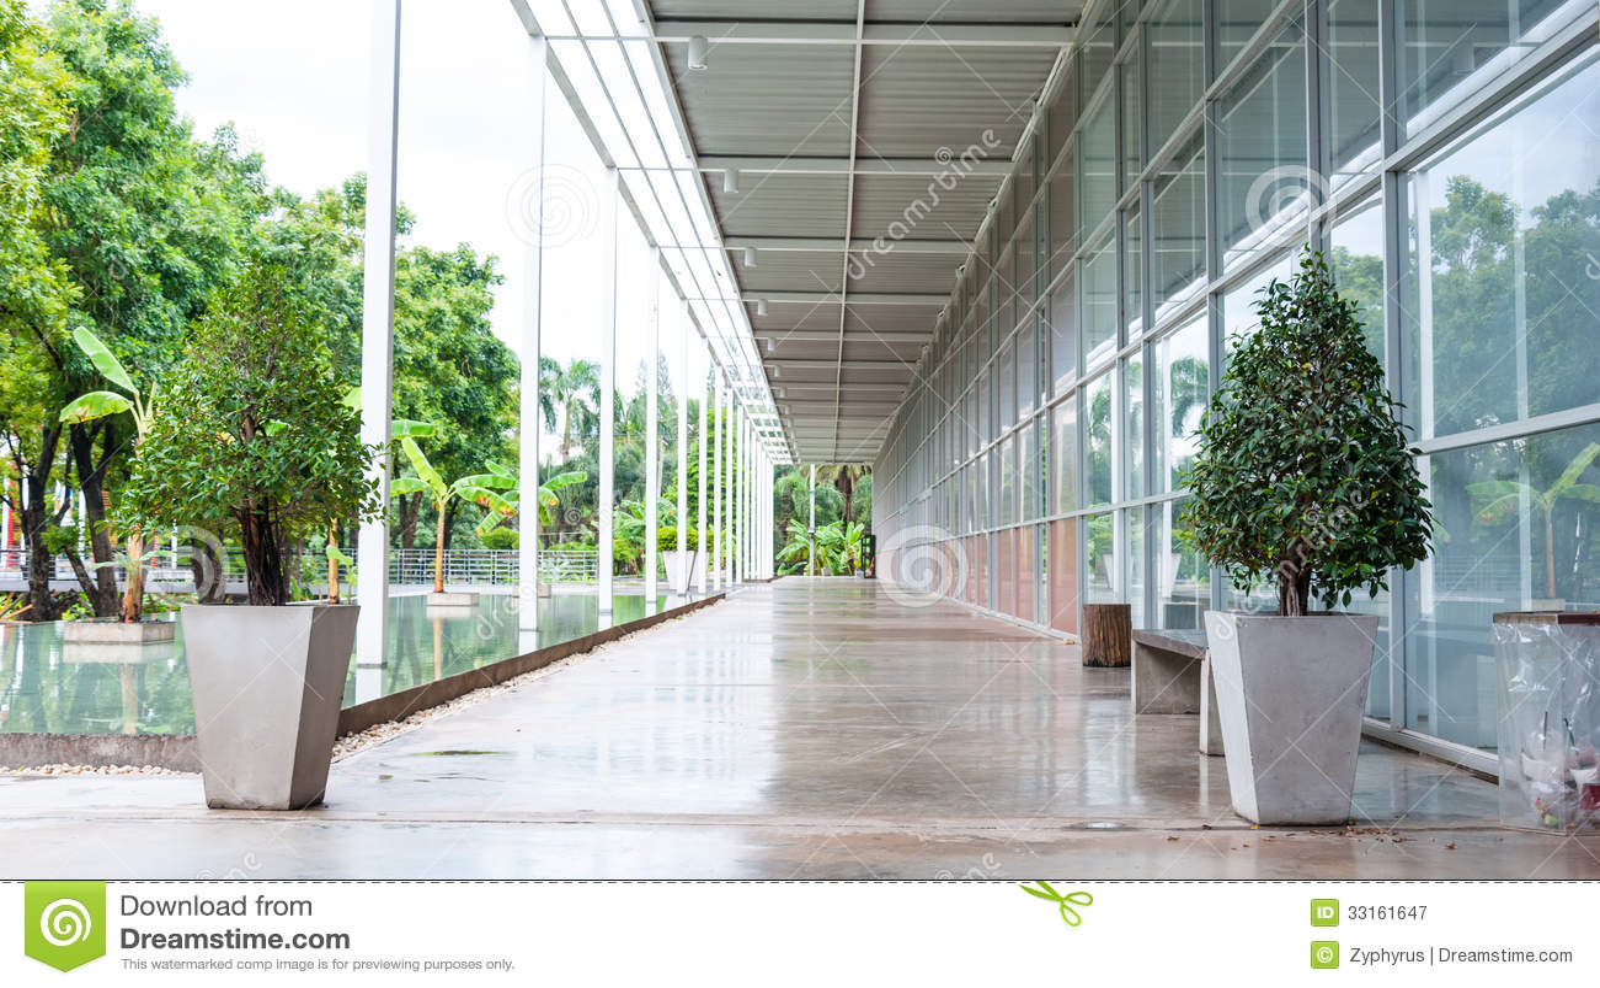 Corridor Roof Design: Outdoor Corridor Of Architecture Perspective Stock Image